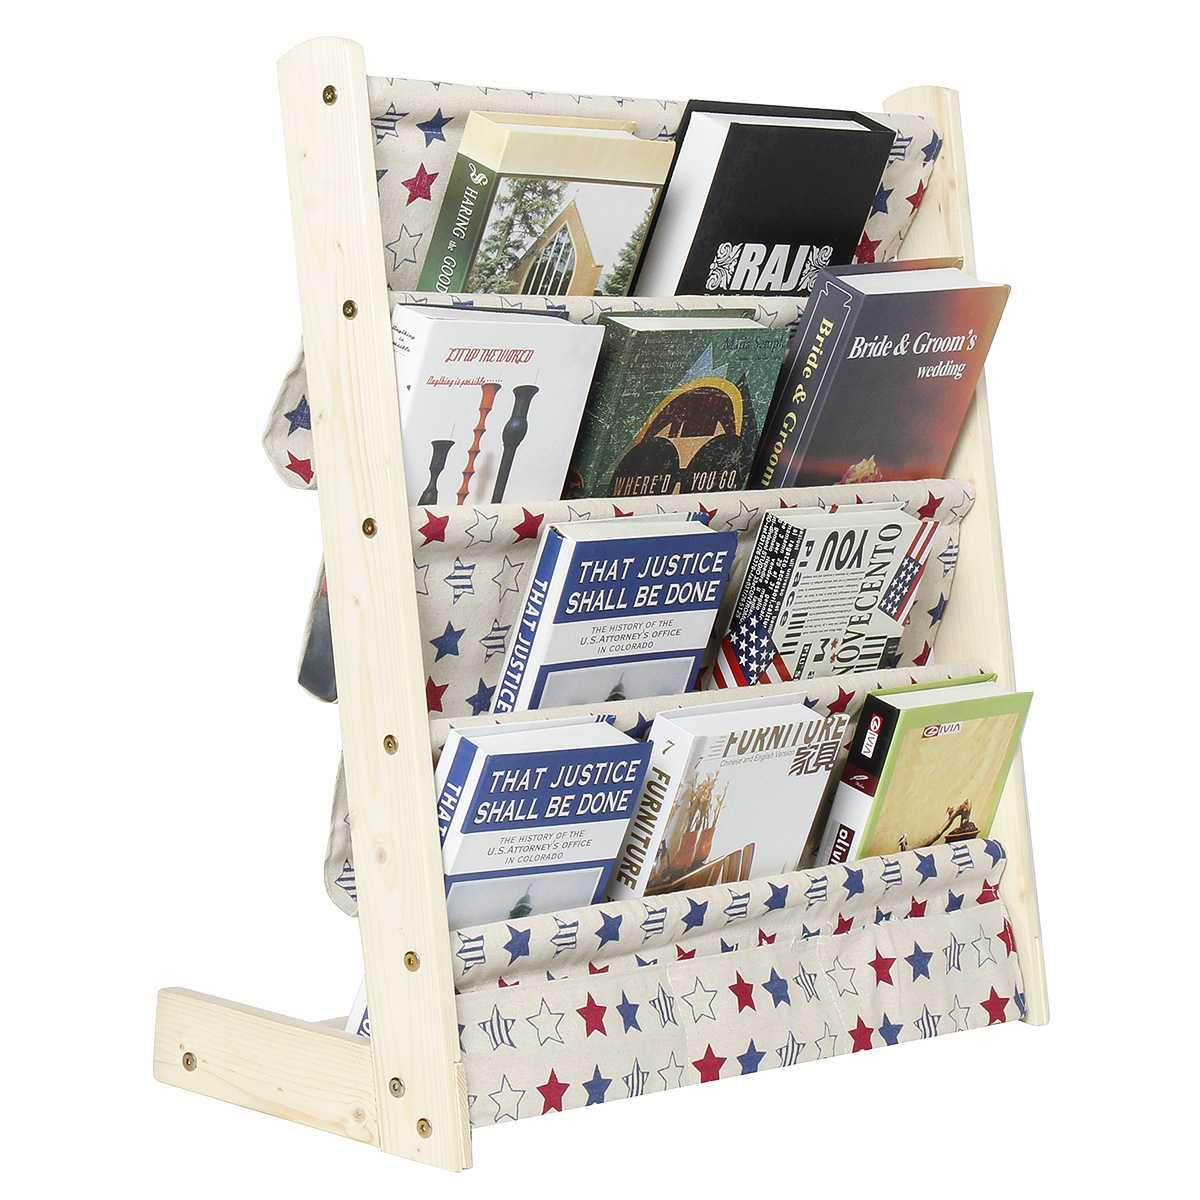 5/7 Tiers Kids Wooden Bookshelf Storage Racks Bookcase Display Organizer Holder Children Bookshelf Home Decorations